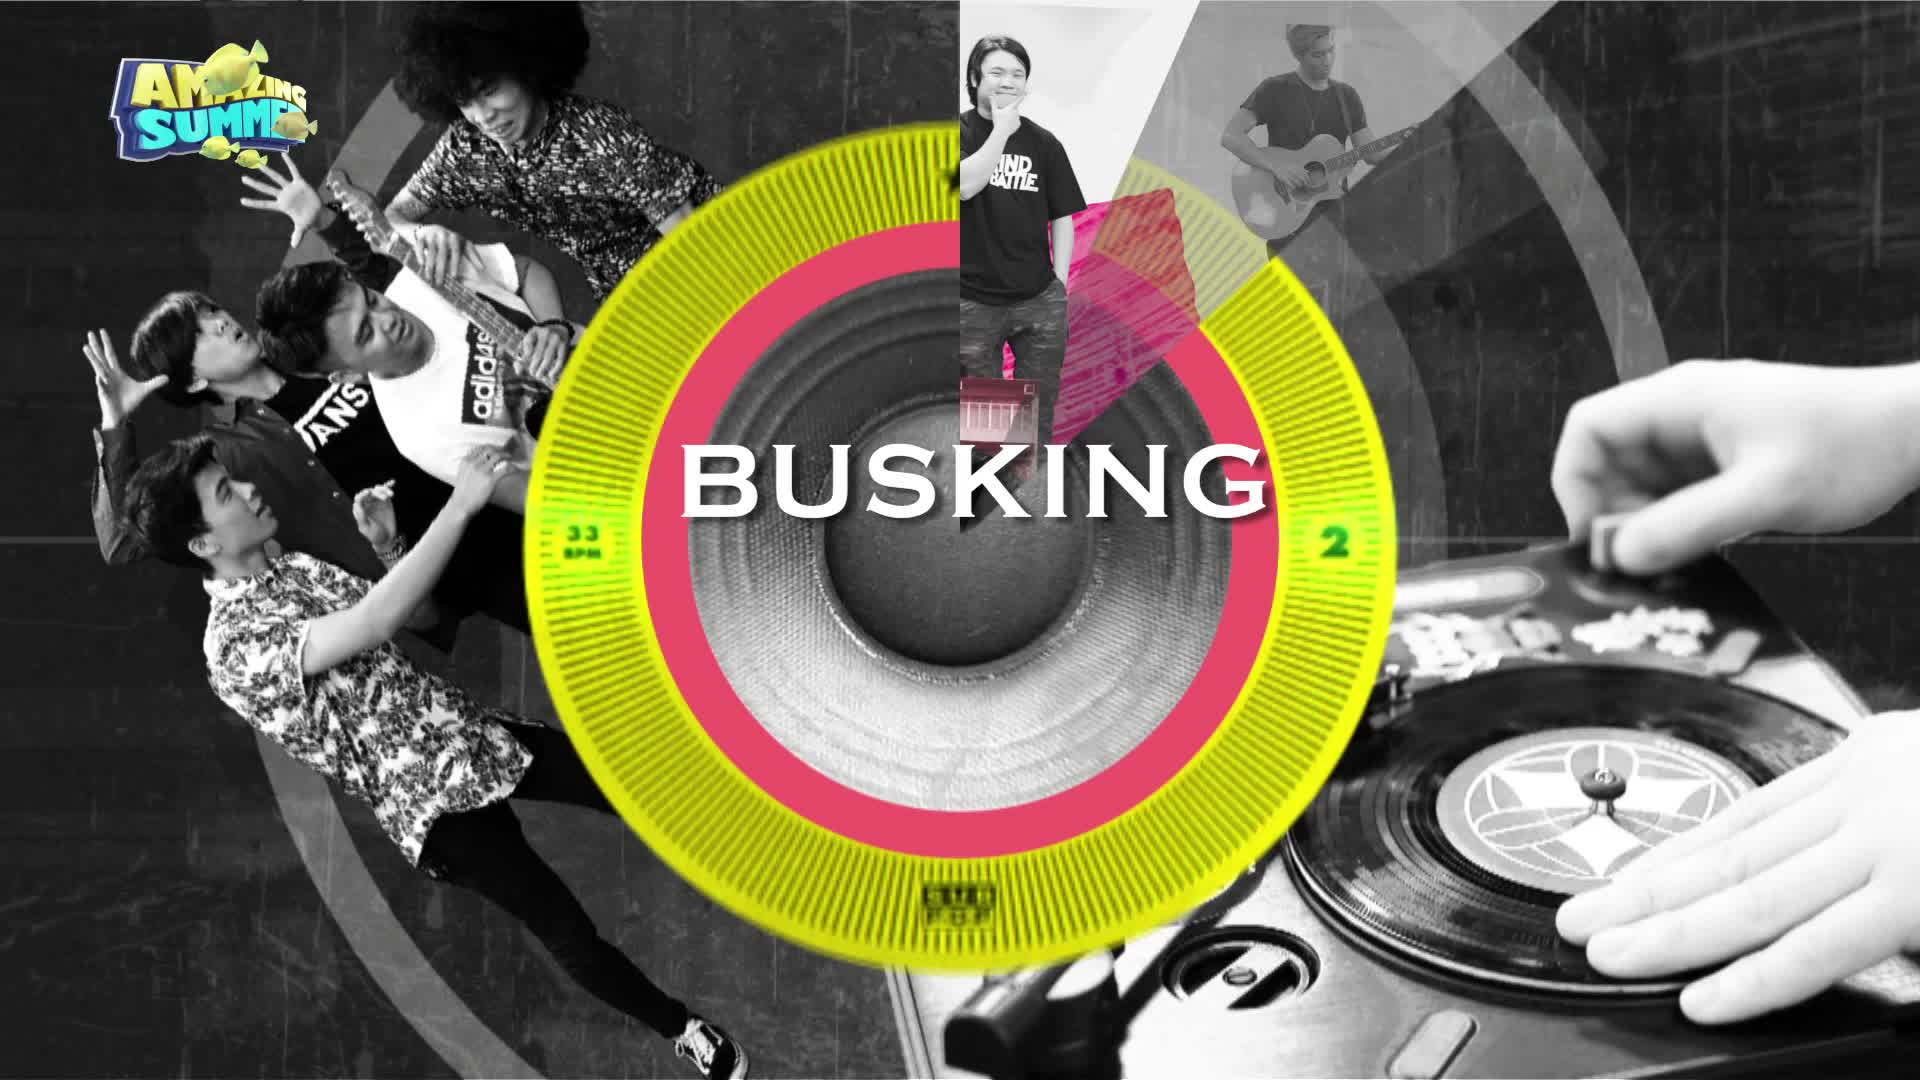 《Busking不停音樂》逢星期五夜晚9點J2